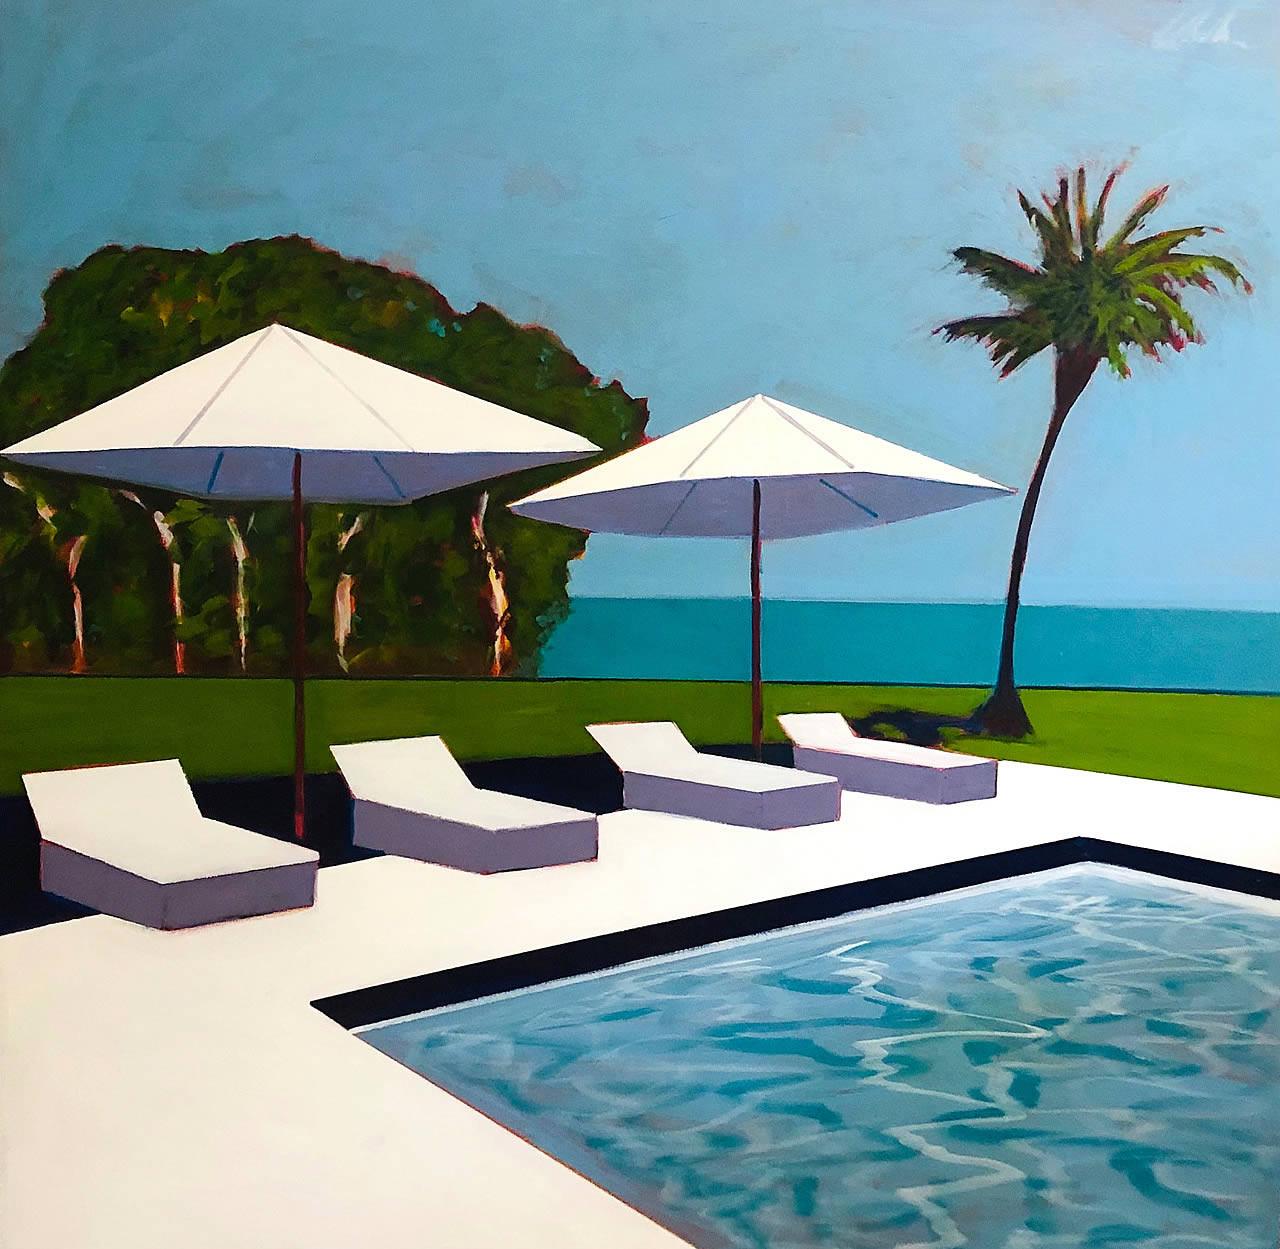 Pool, White Umbrellas and Palm